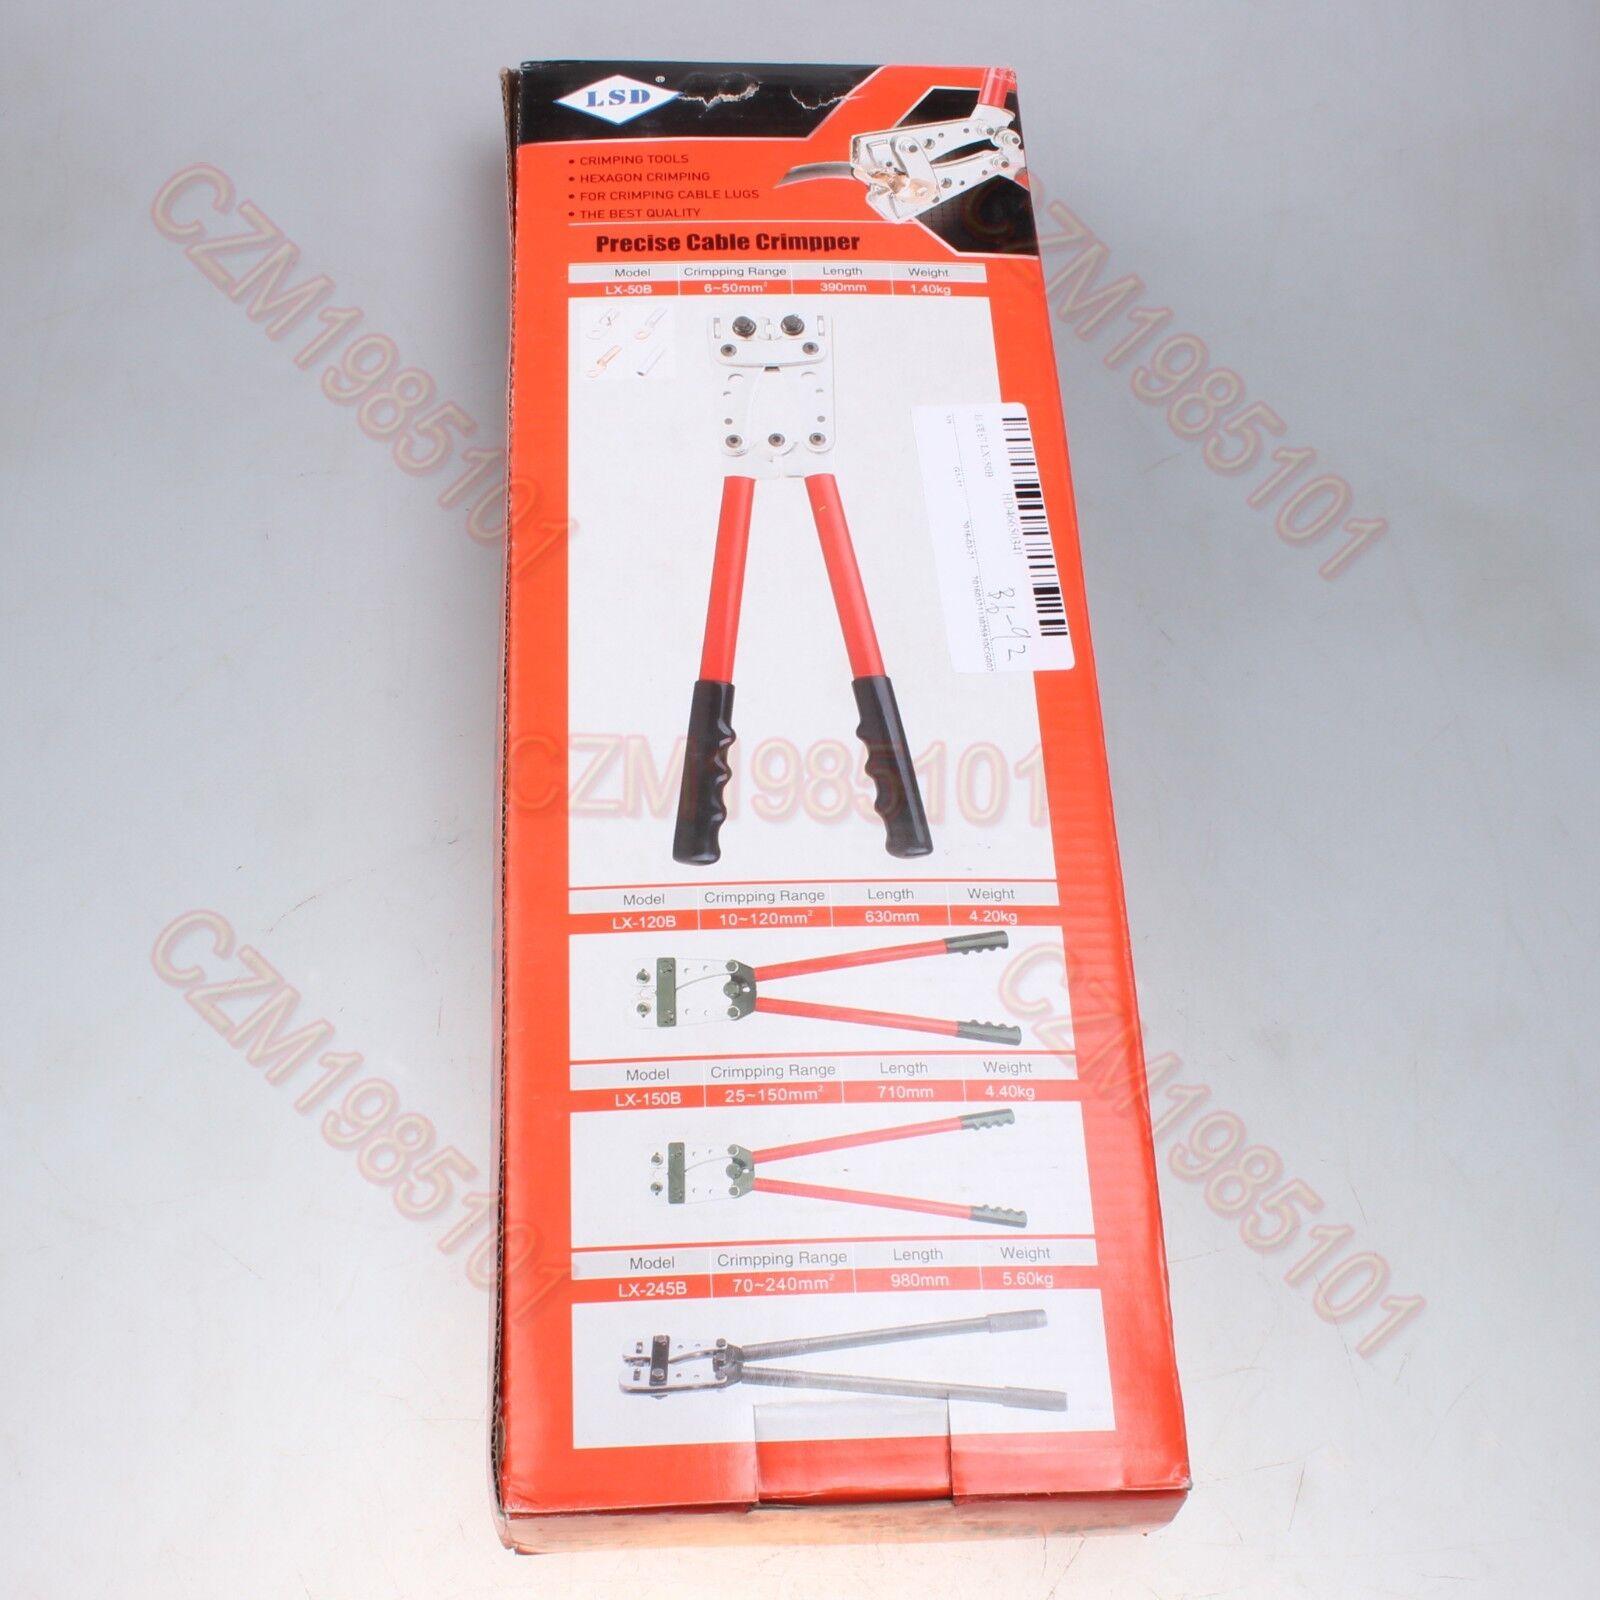 heavy duty hex crimping tool lx 50b cable lug connectors crimper range 6 50mm cad. Black Bedroom Furniture Sets. Home Design Ideas